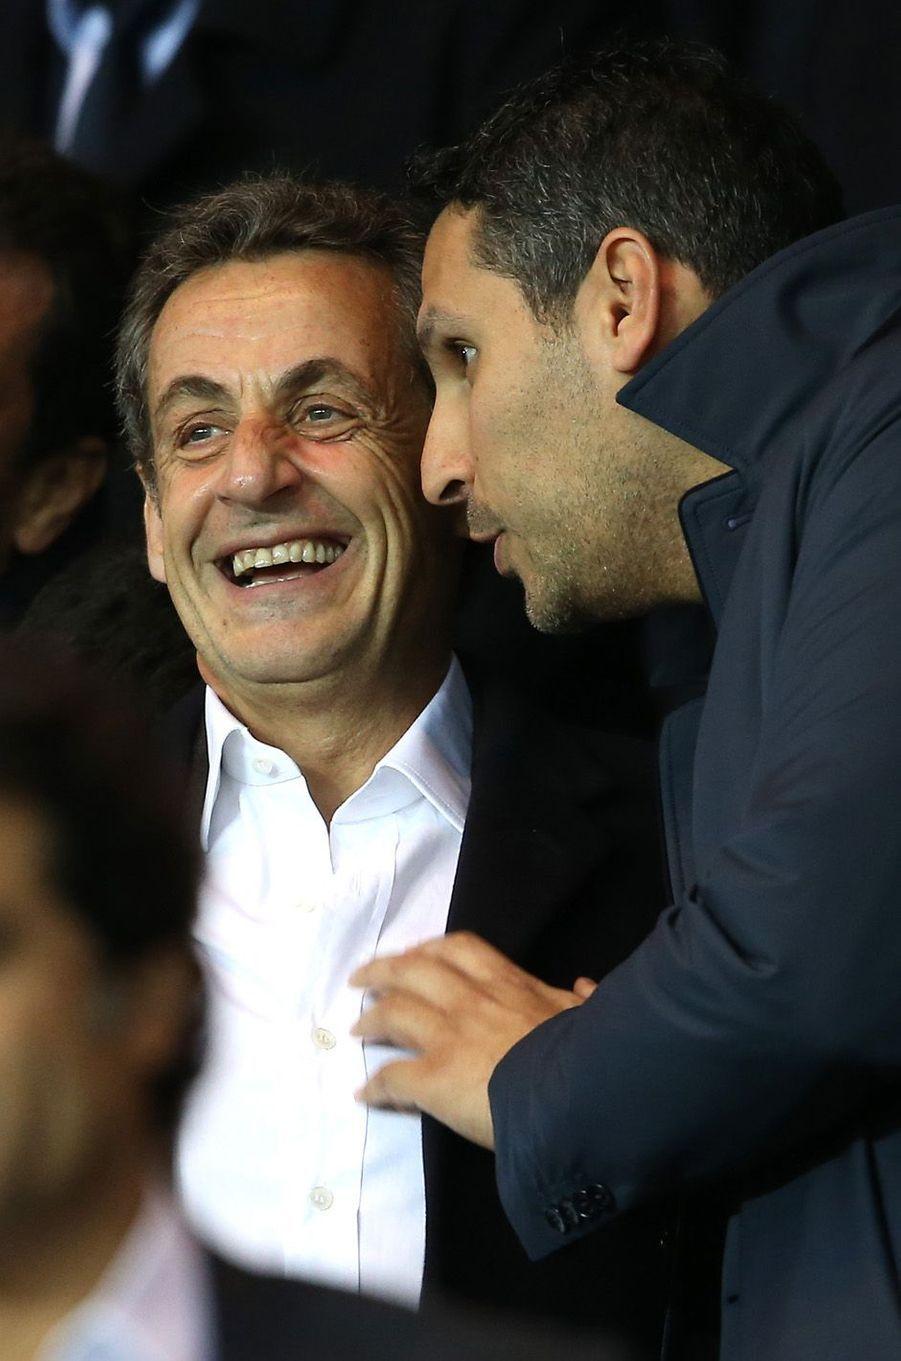 Nicolas Sarkozy avec le président du club de football Manchester City, Khaldoon Al Mubarak